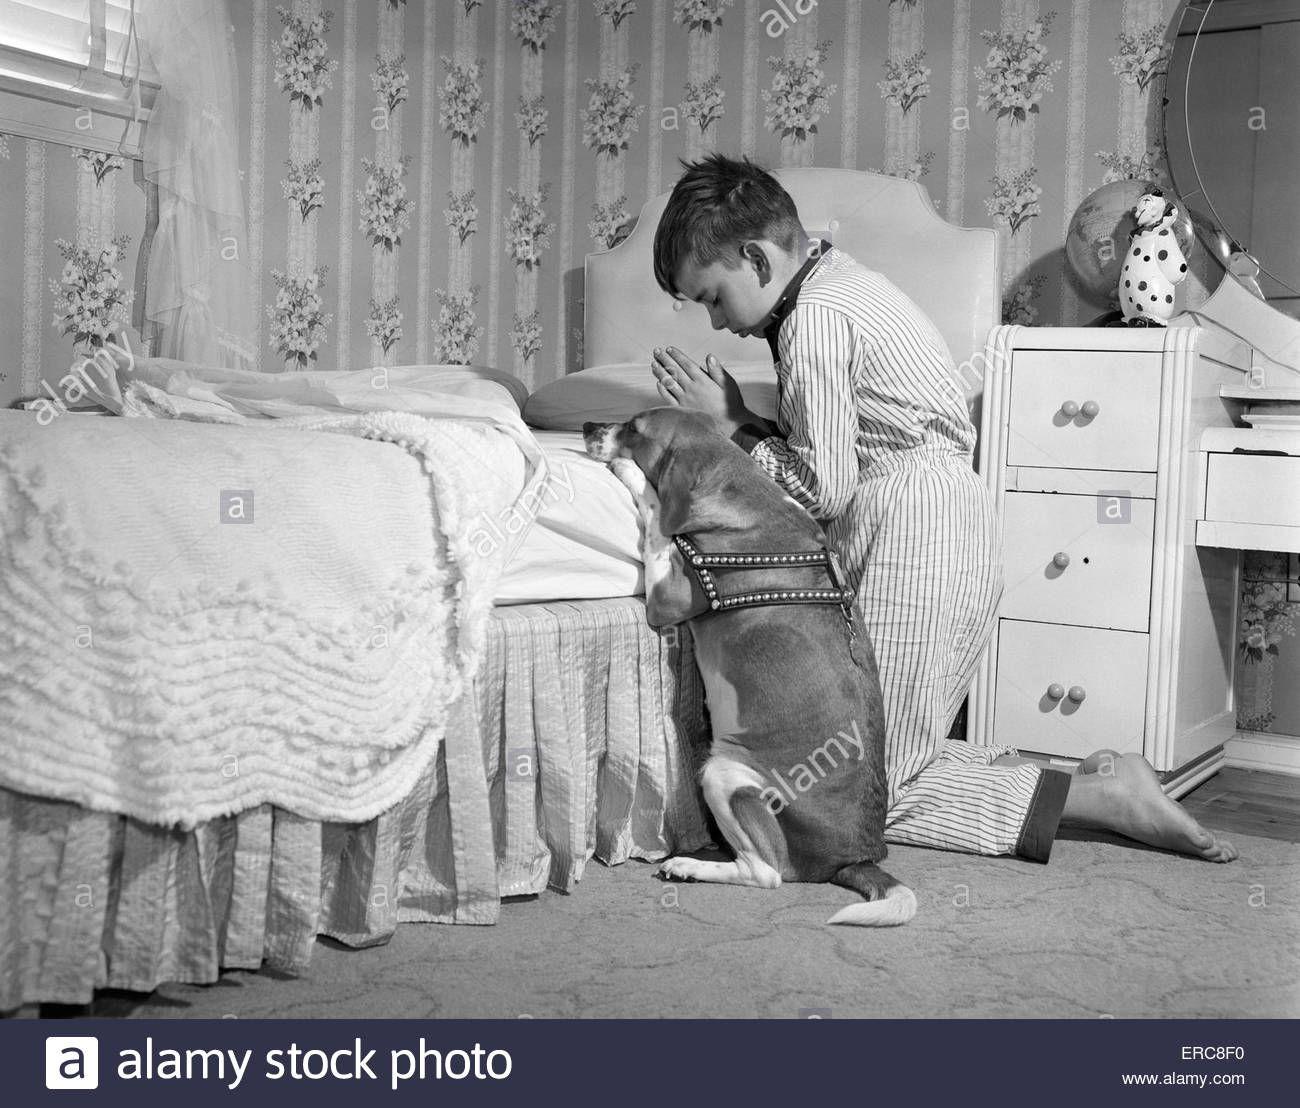 1950s Boy Amp Dog Praying At Bedside Days Of Old Days Of